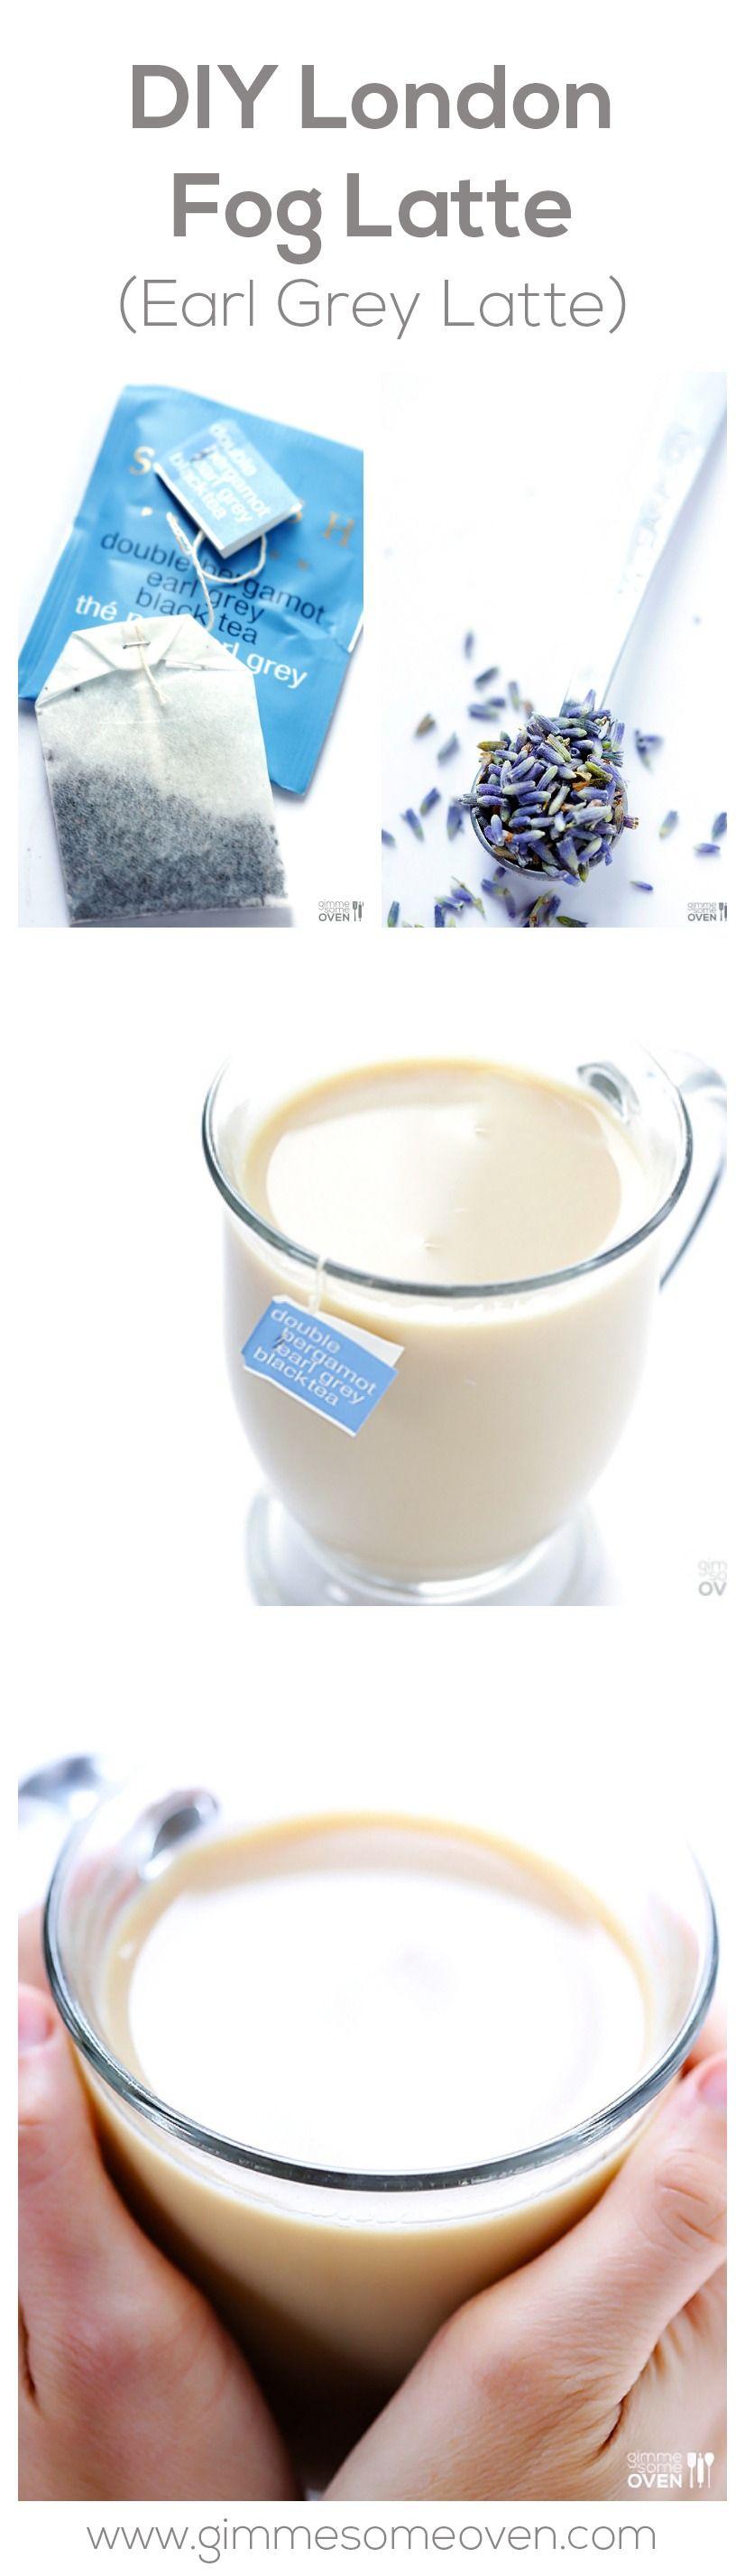 London fog tea latte earl grey latte recipe pinterest earl diy london fog latte earl grey latte so easy to make at solutioingenieria Images